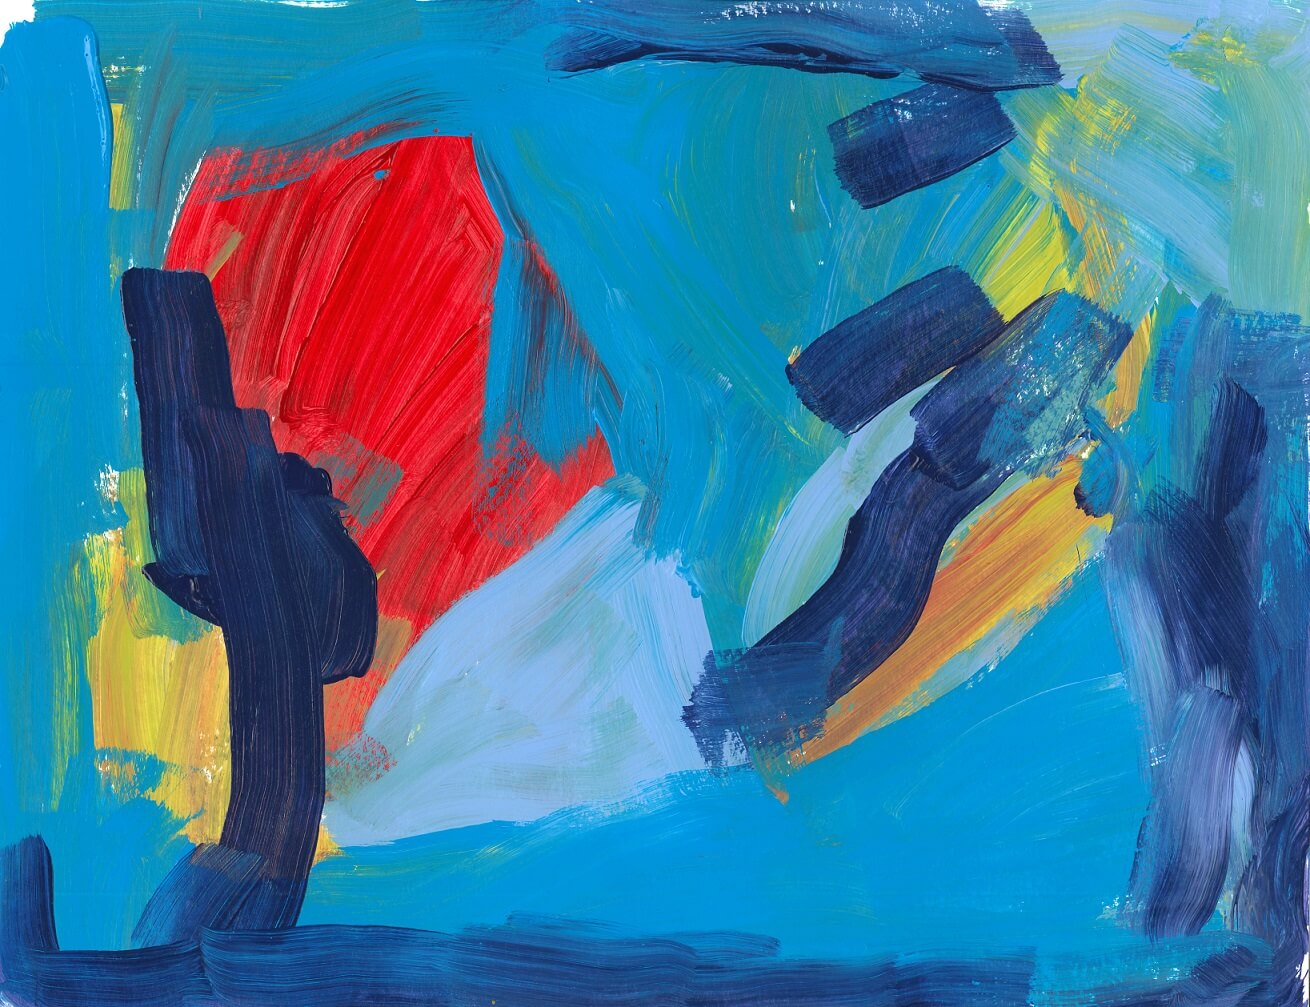 Vicuña's Upcoming Art Shows